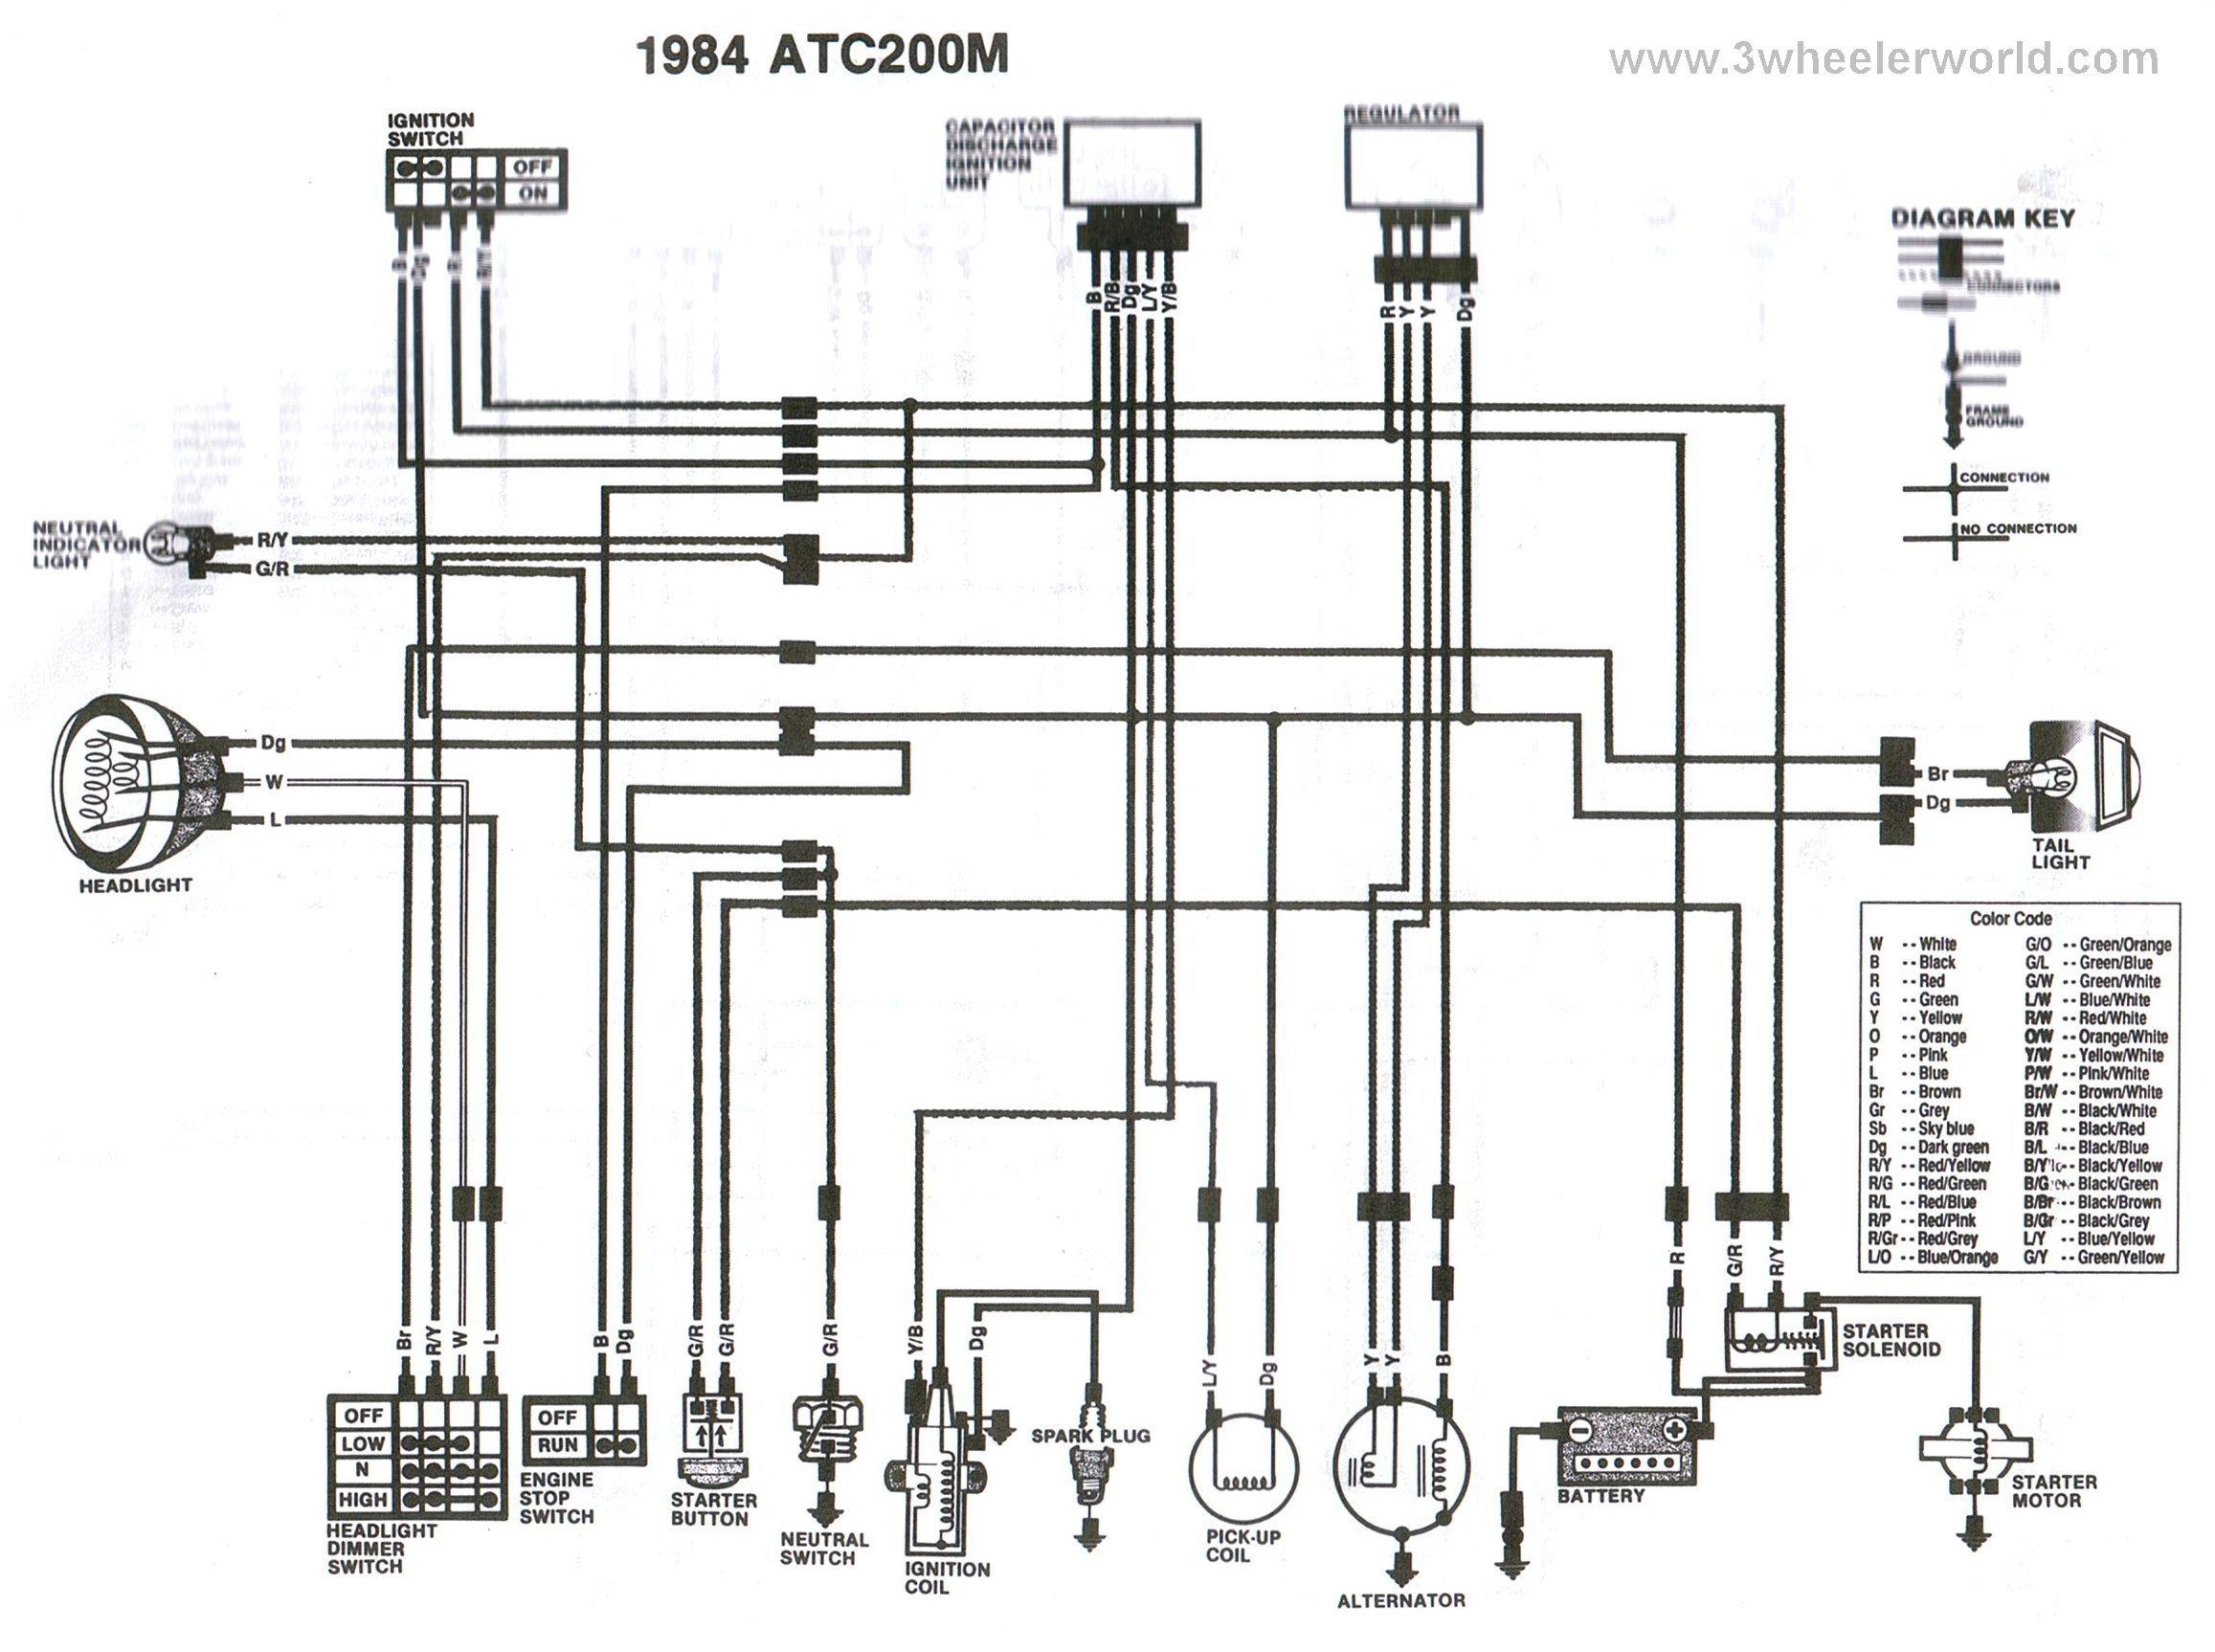 YF_1416] Atc 125M Wiring Diagram On Wiring Diagram For 1987 Honda 4 WheelerChro Hison Cosm Vira Effl Cajos Vira Mohammedshrine Librar Wiring 101